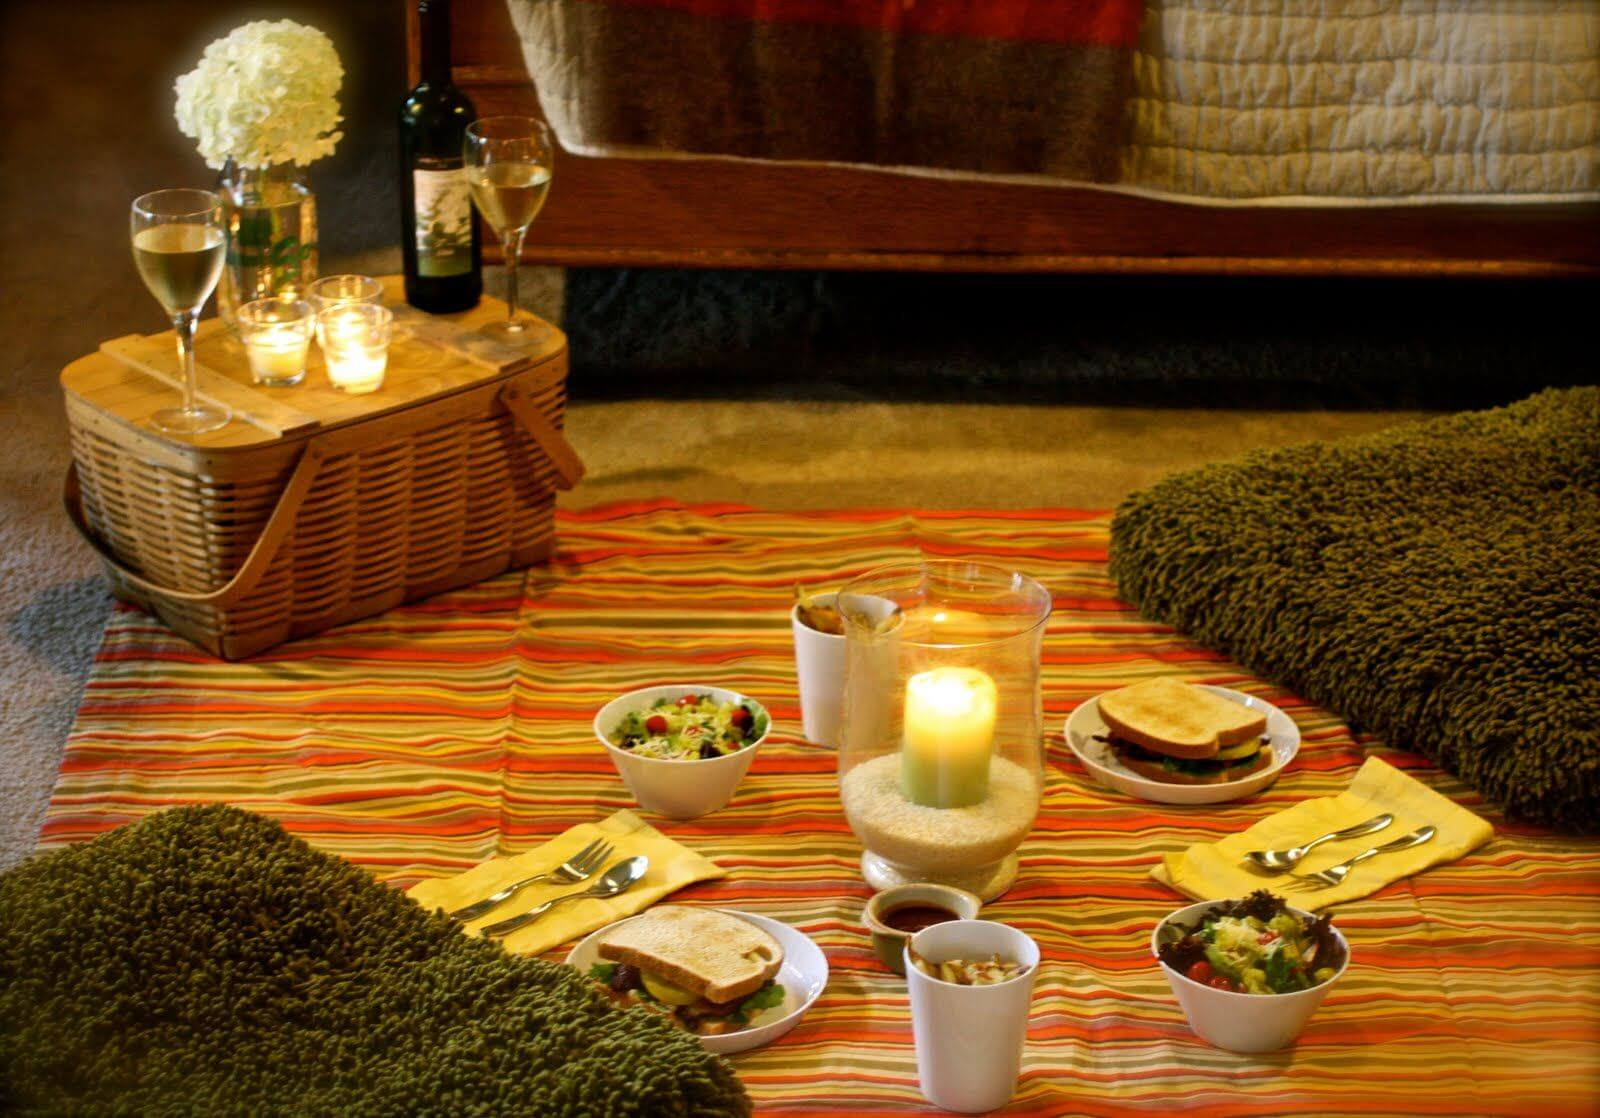 Set up an indoor picnic